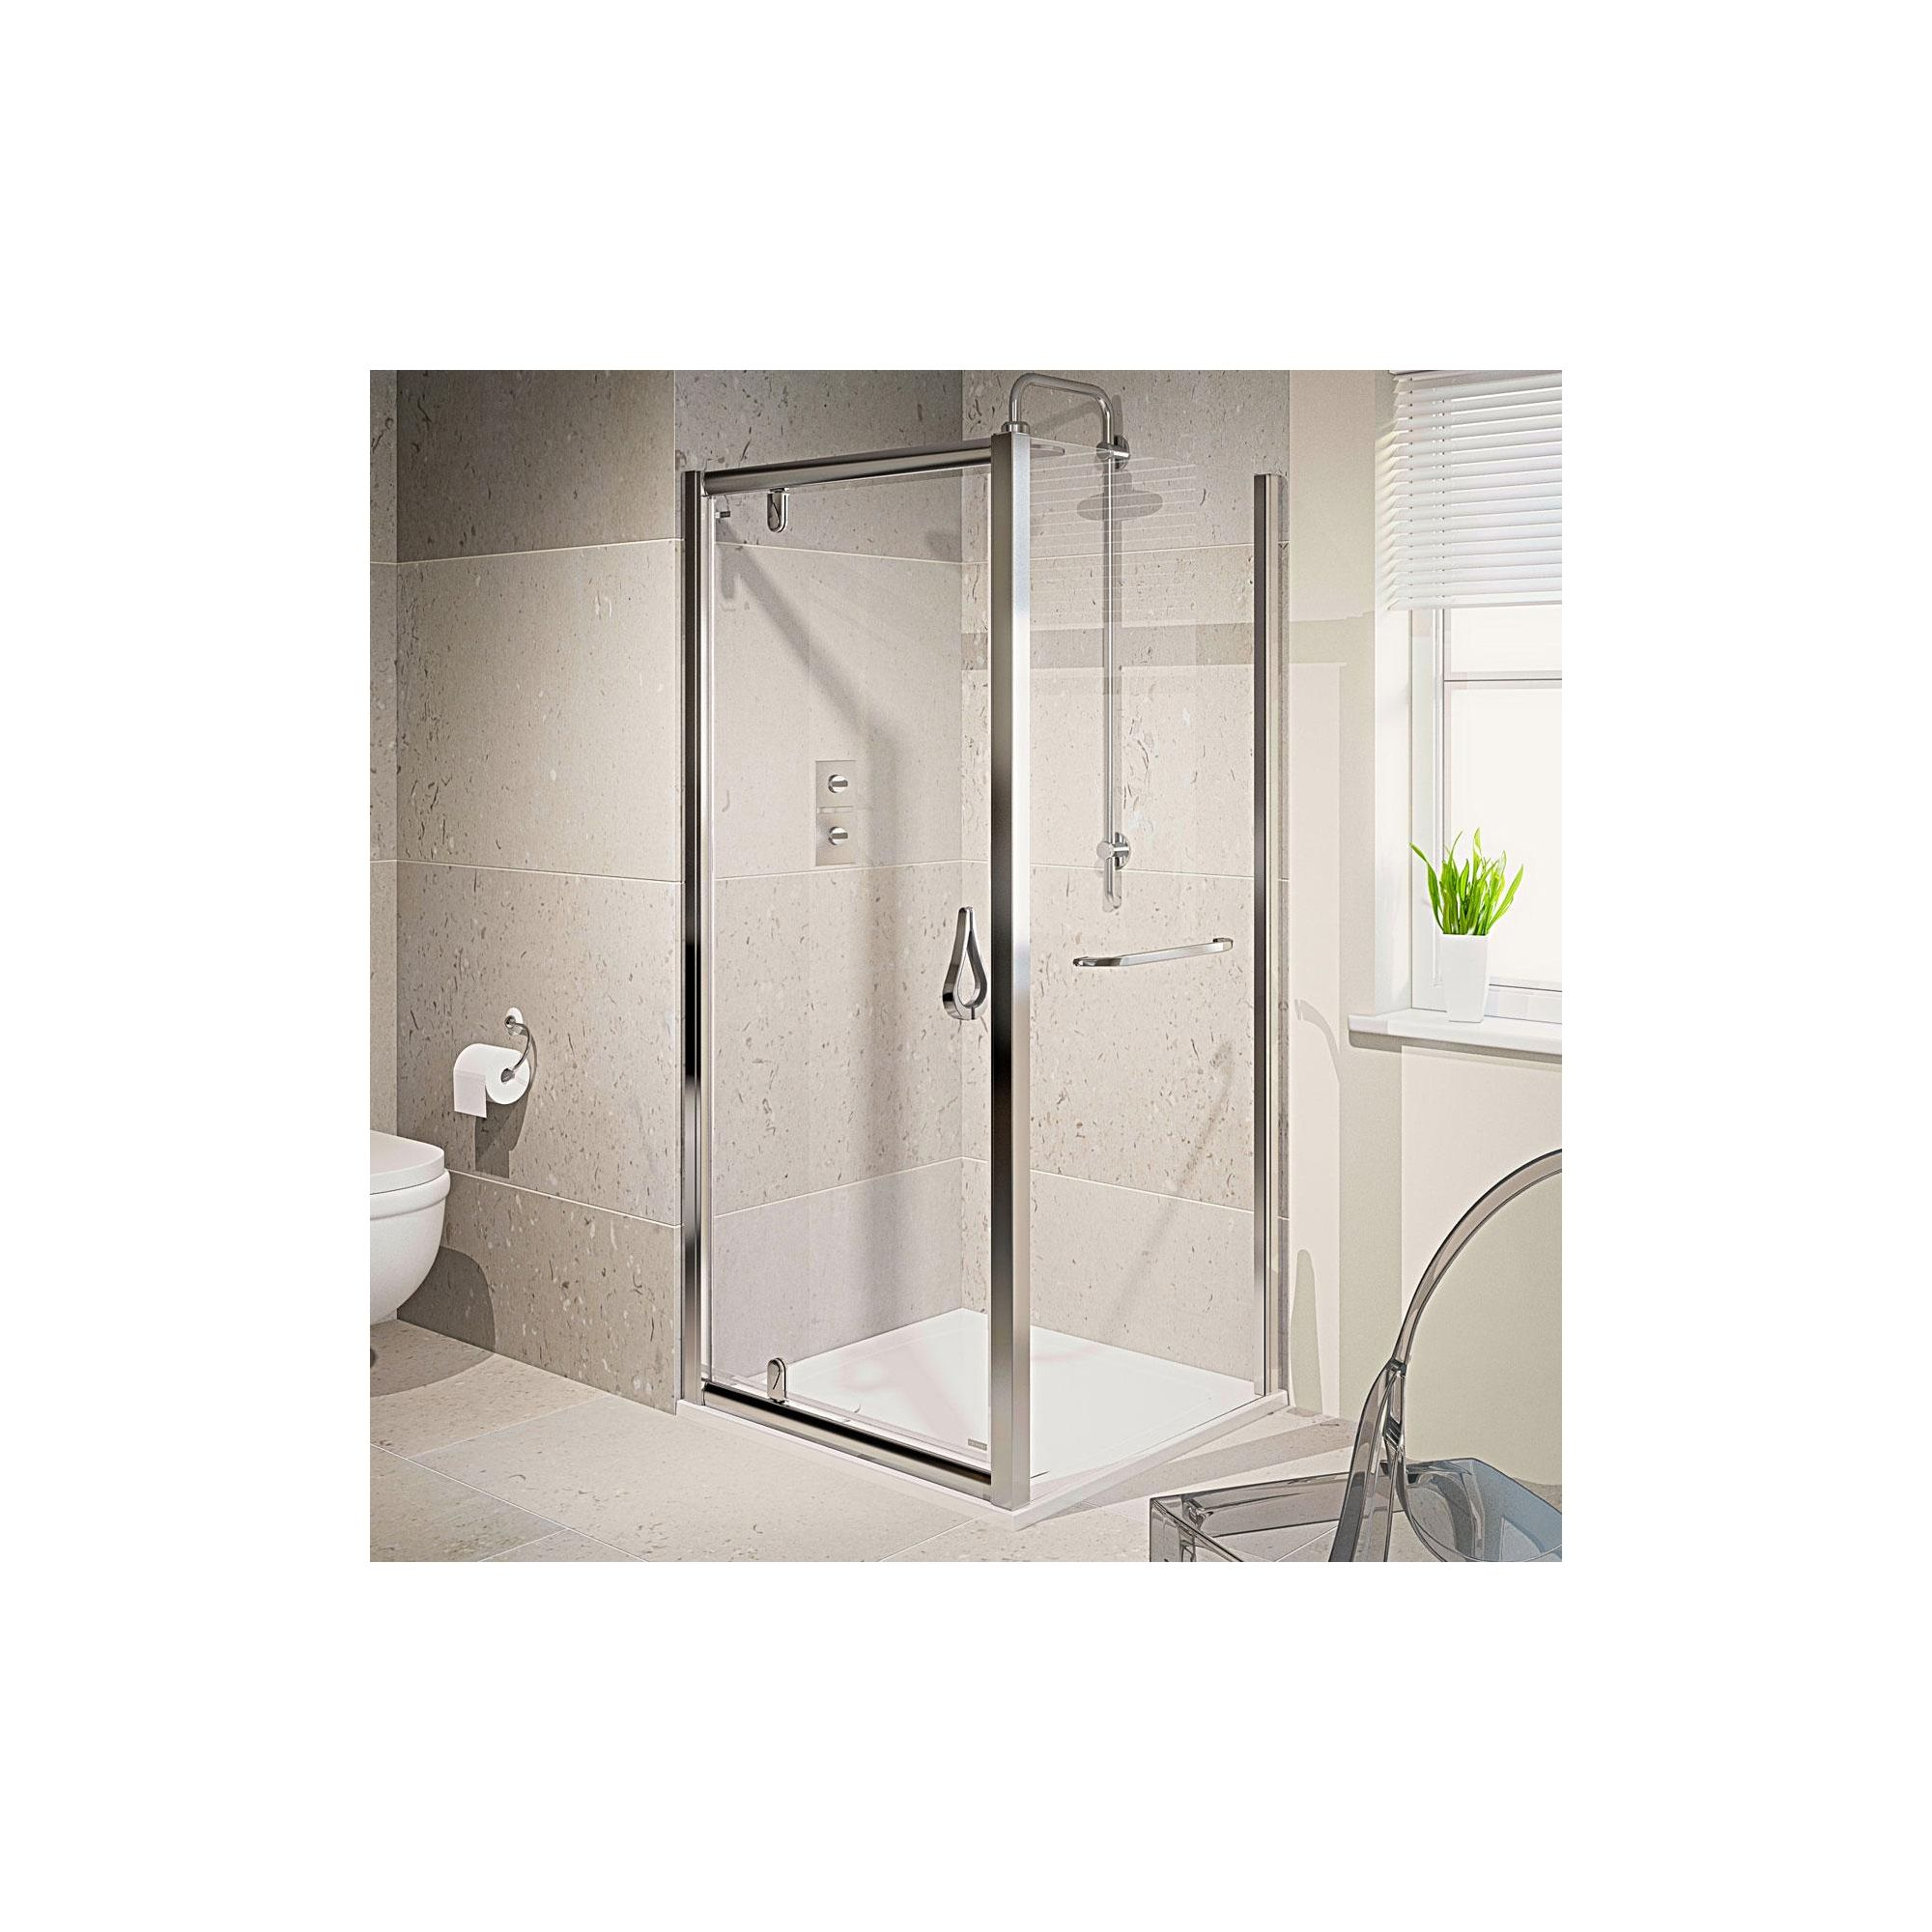 Aqualux AQUA6 Pivot Shower Door, 760mm Wide, Polished Silver Frame, 6mm Glass at Tesco Direct